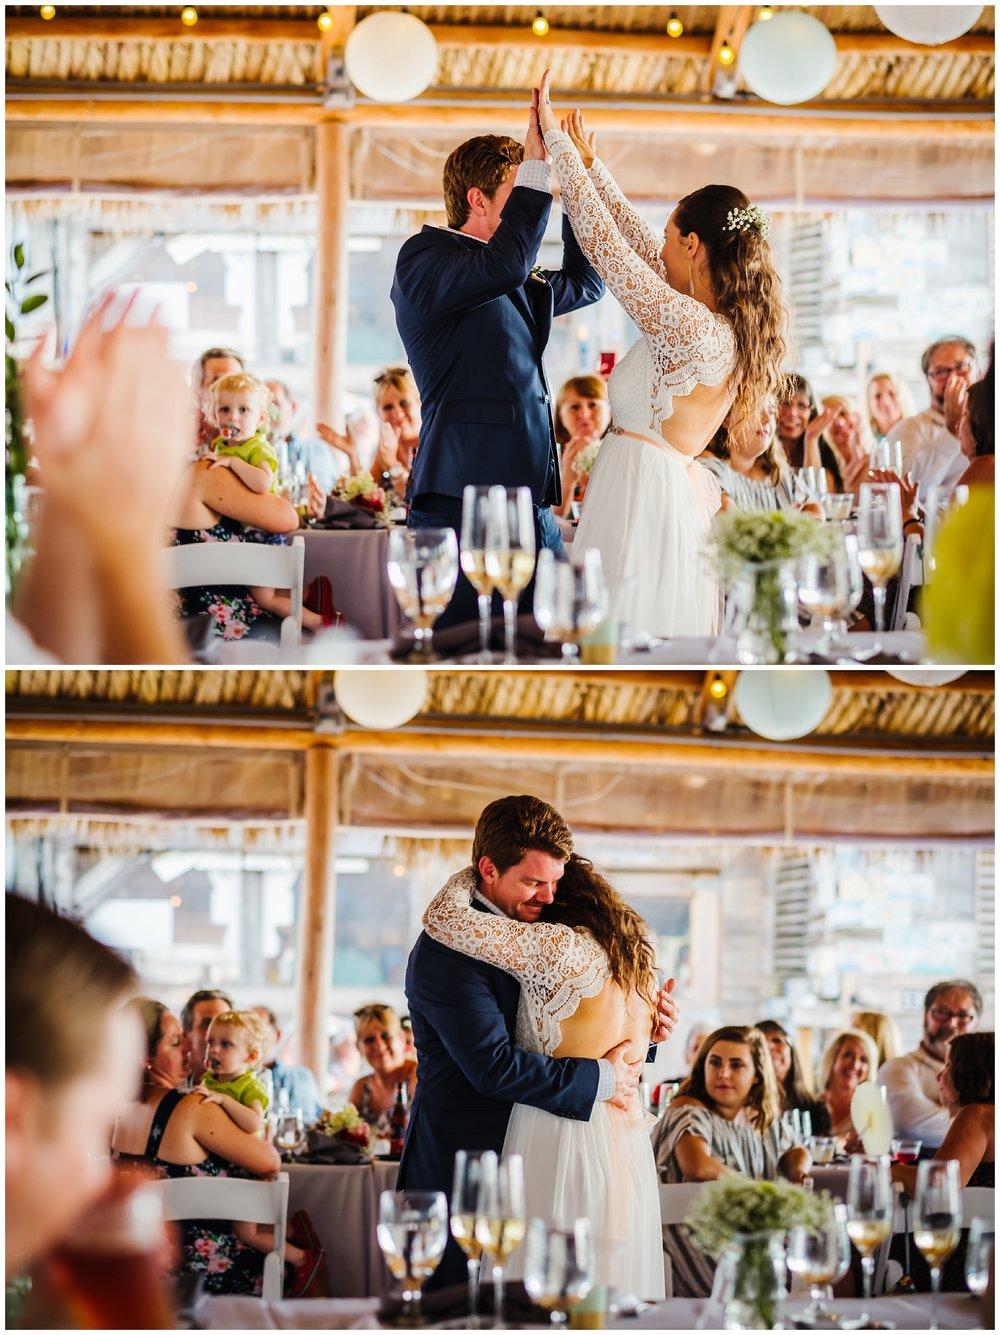 st-pete-wedding-photographer-postcard-inn-sleeve-dress-rain-sunset_0203.jpg